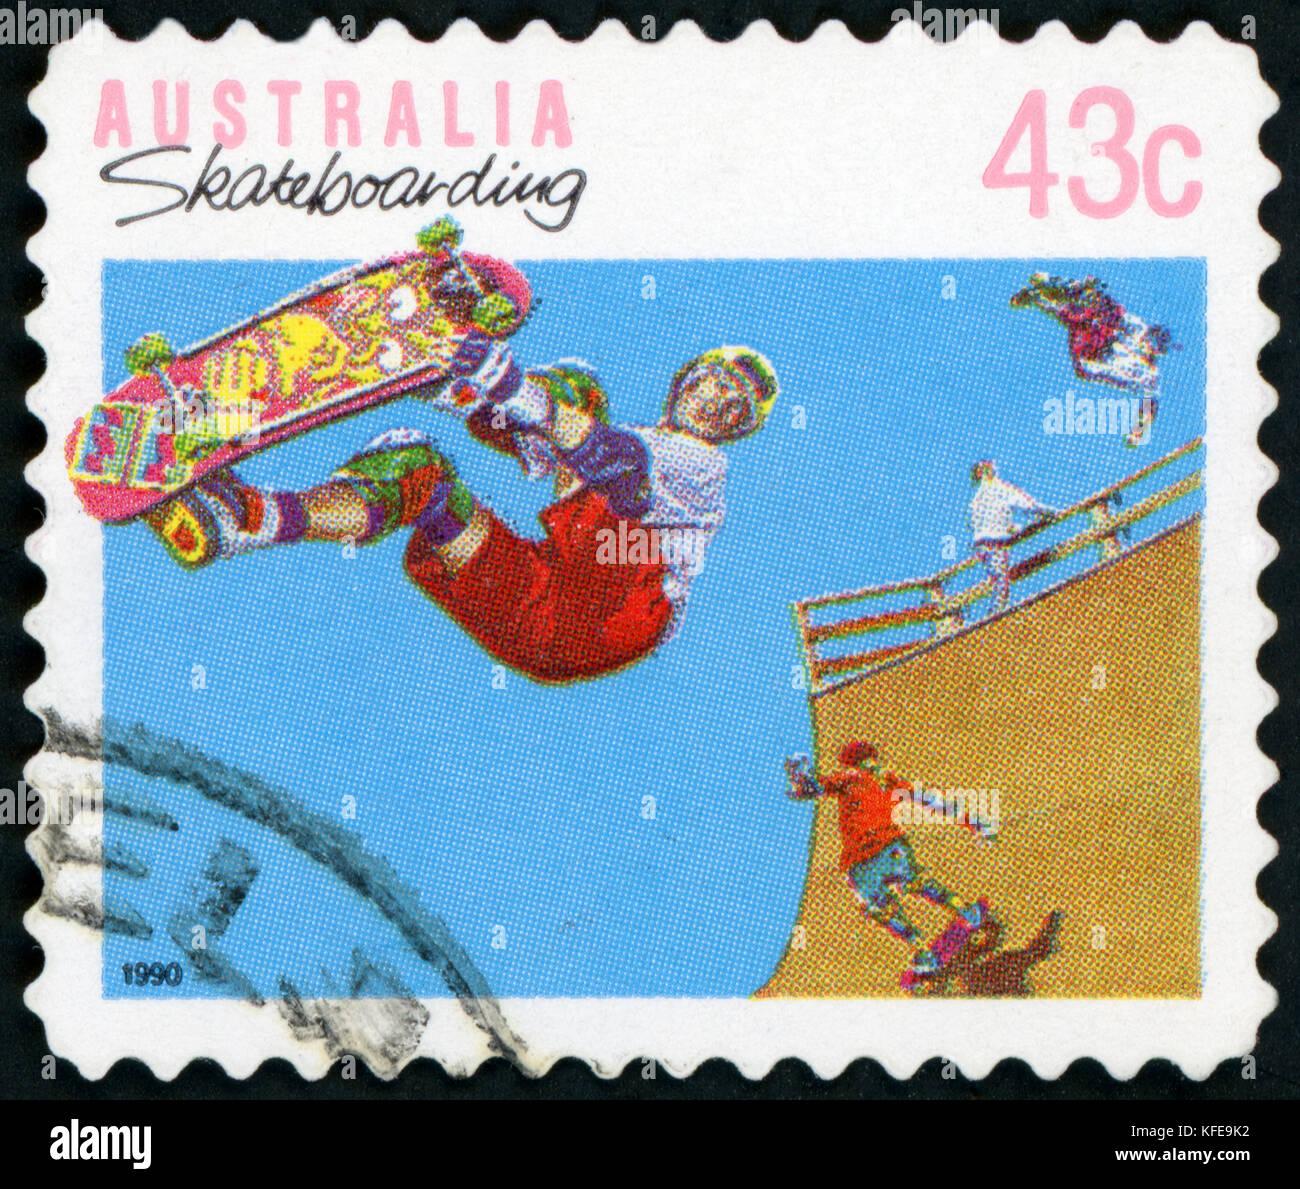 Postage stamp ( Australia - Skatebording ) - Stock Image